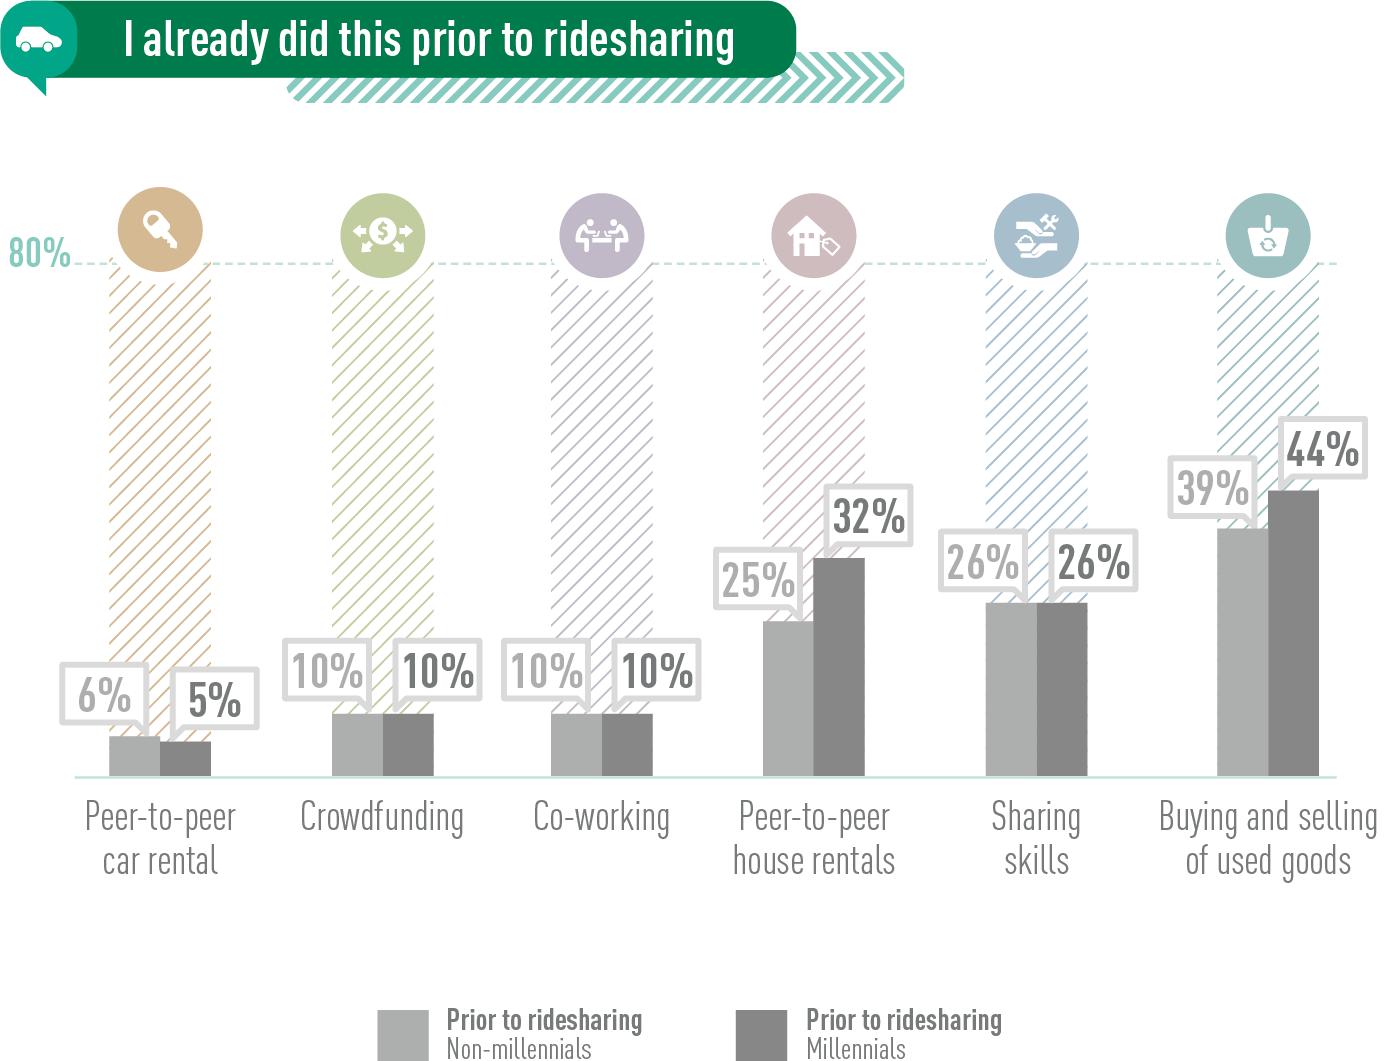 Prior Ridesharing